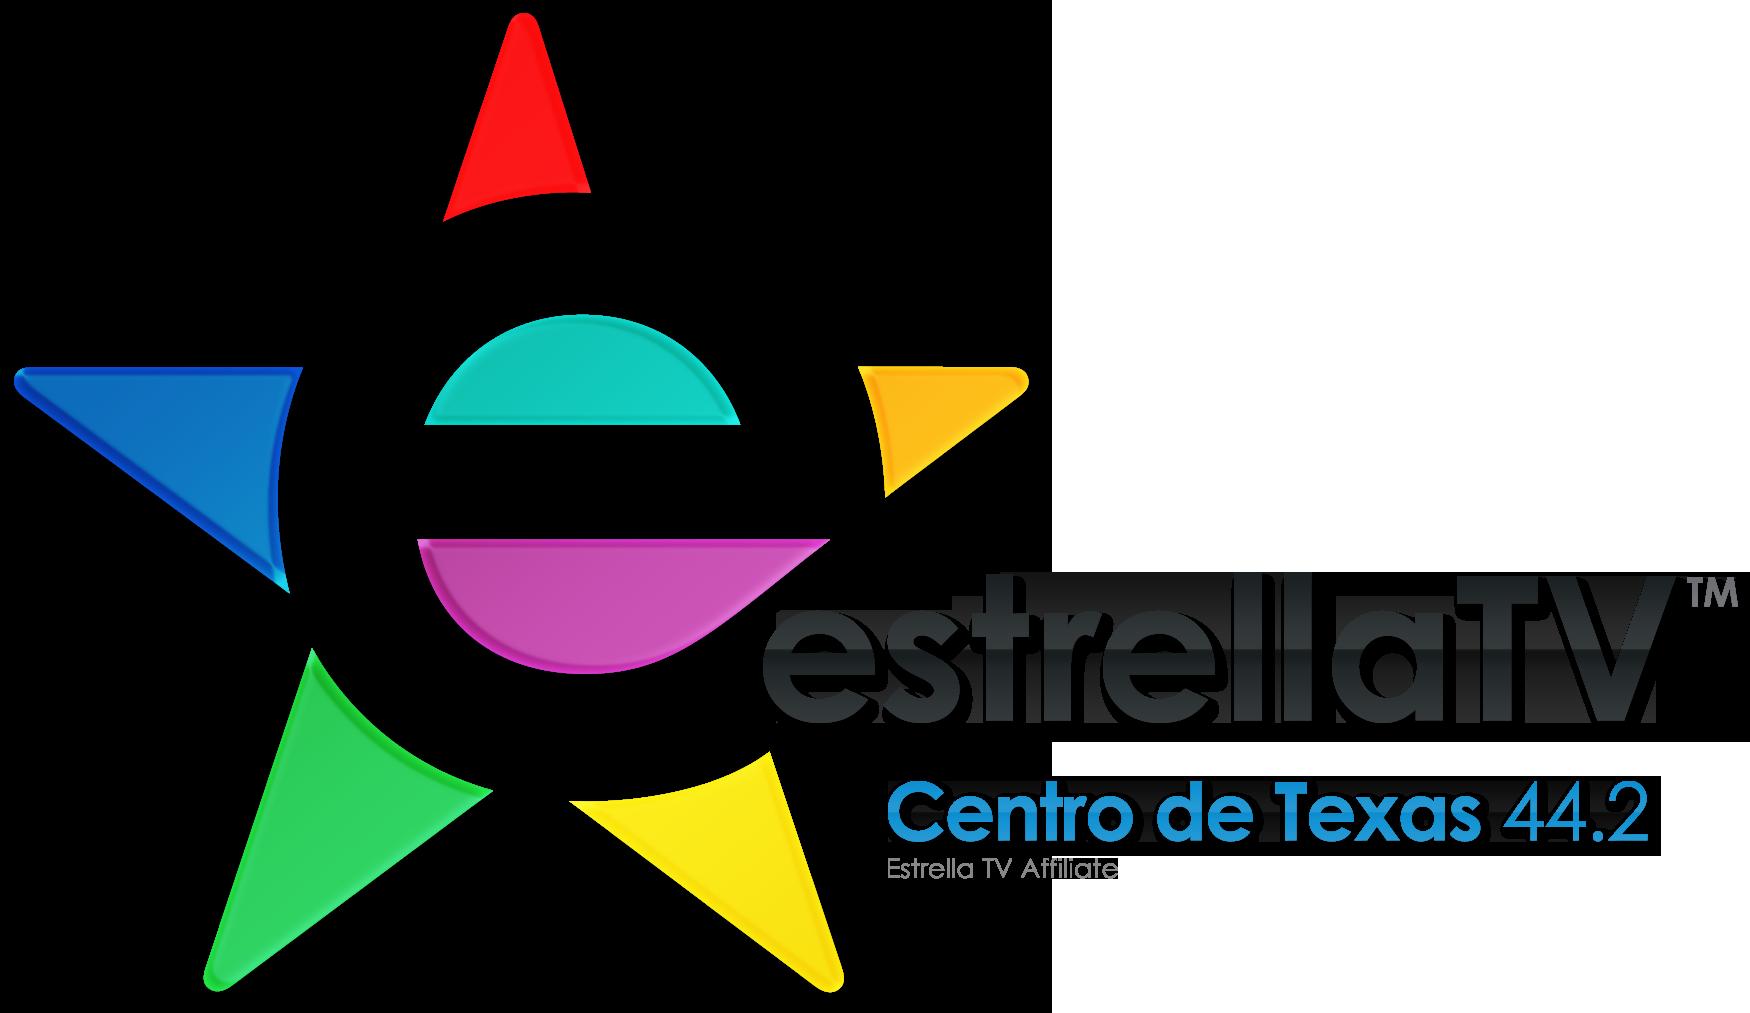 estrellatv_44-logo